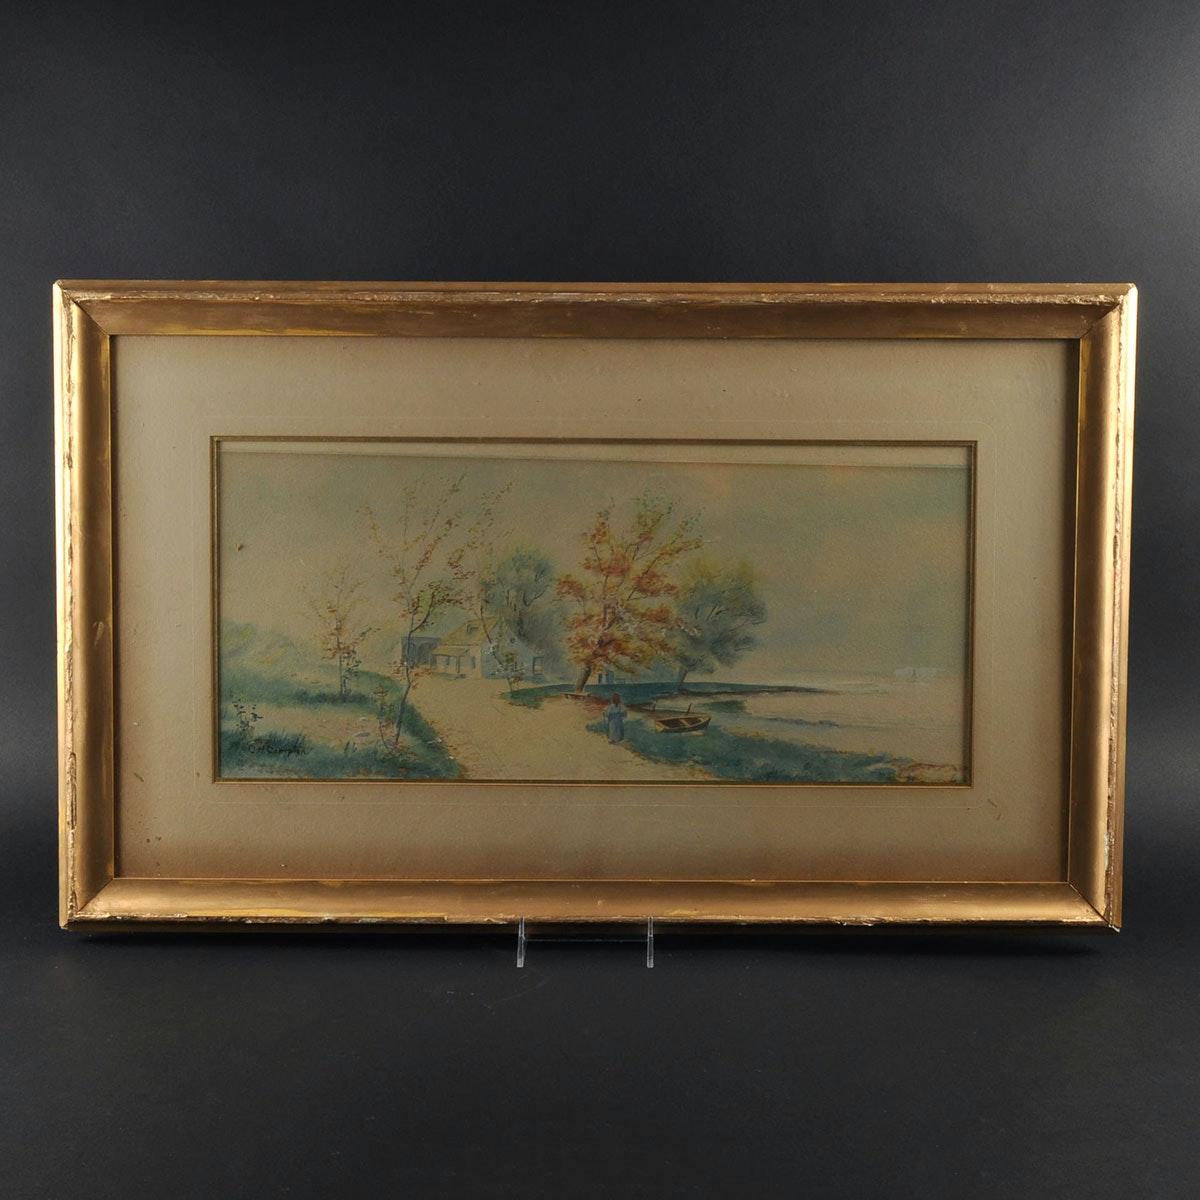 Original Watercolor Landscape by C.H. Compton